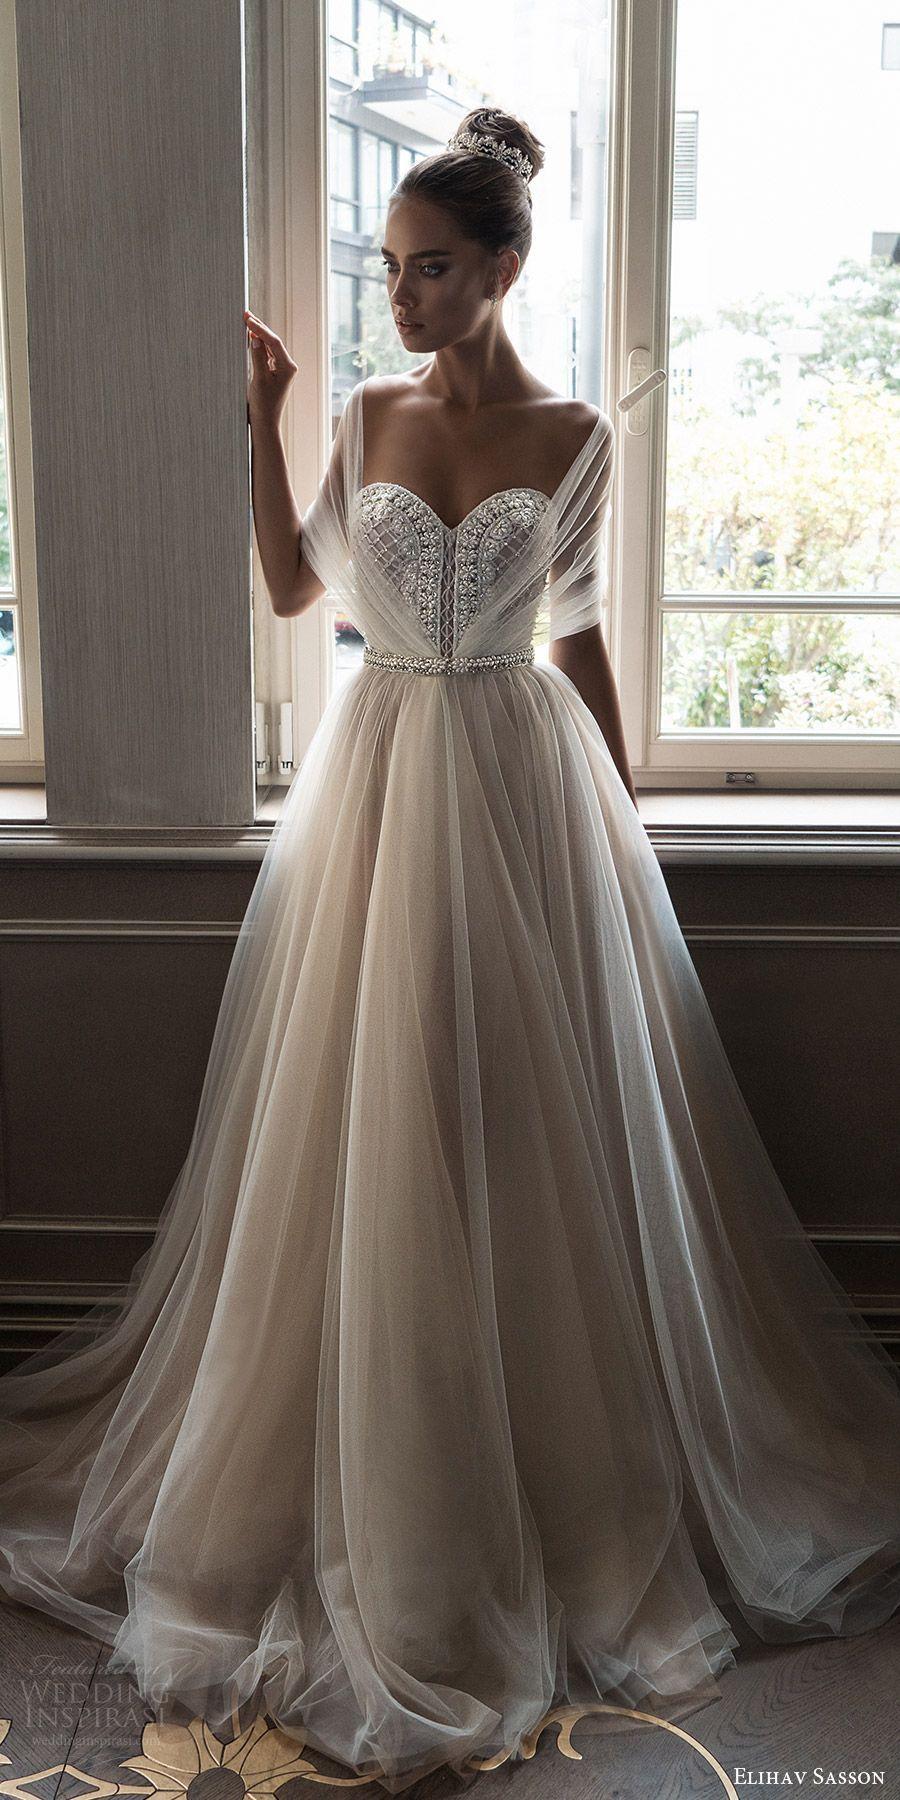 Elihav sasson spring bridal illusion half sleeves sweetheart